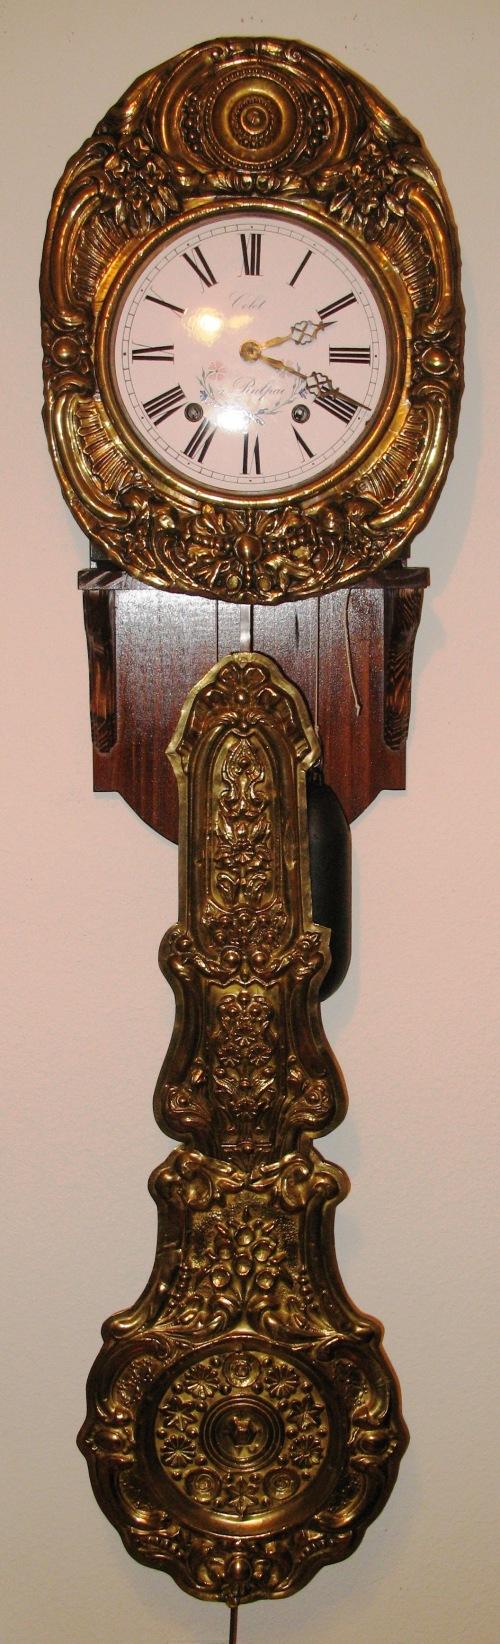 French Morbier (Comtoise) Clock. ca 1860.